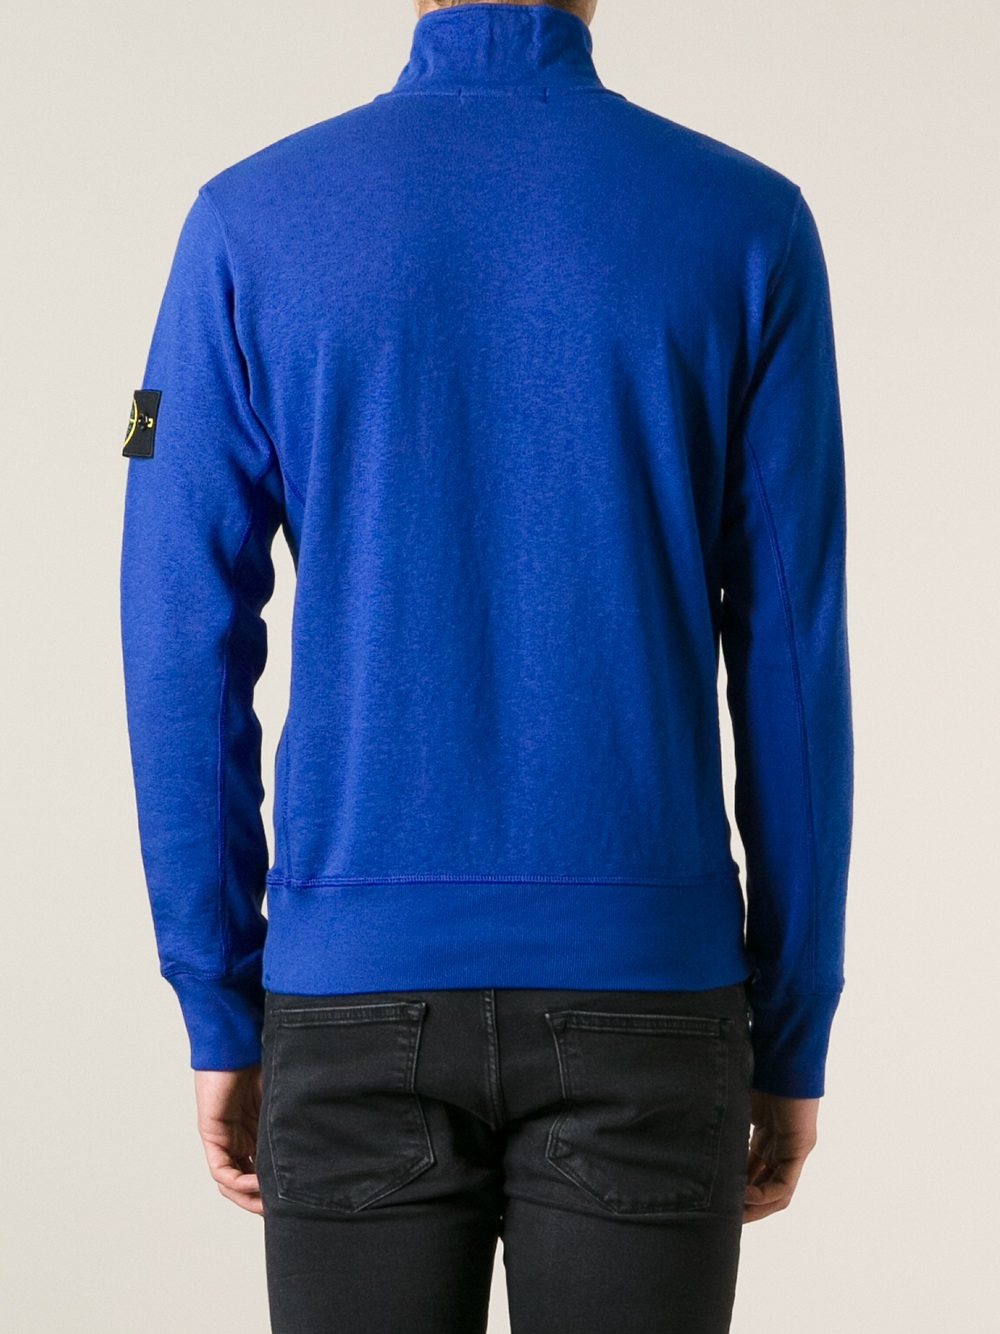 stone island funnel neck sweater in blue for men lyst. Black Bedroom Furniture Sets. Home Design Ideas